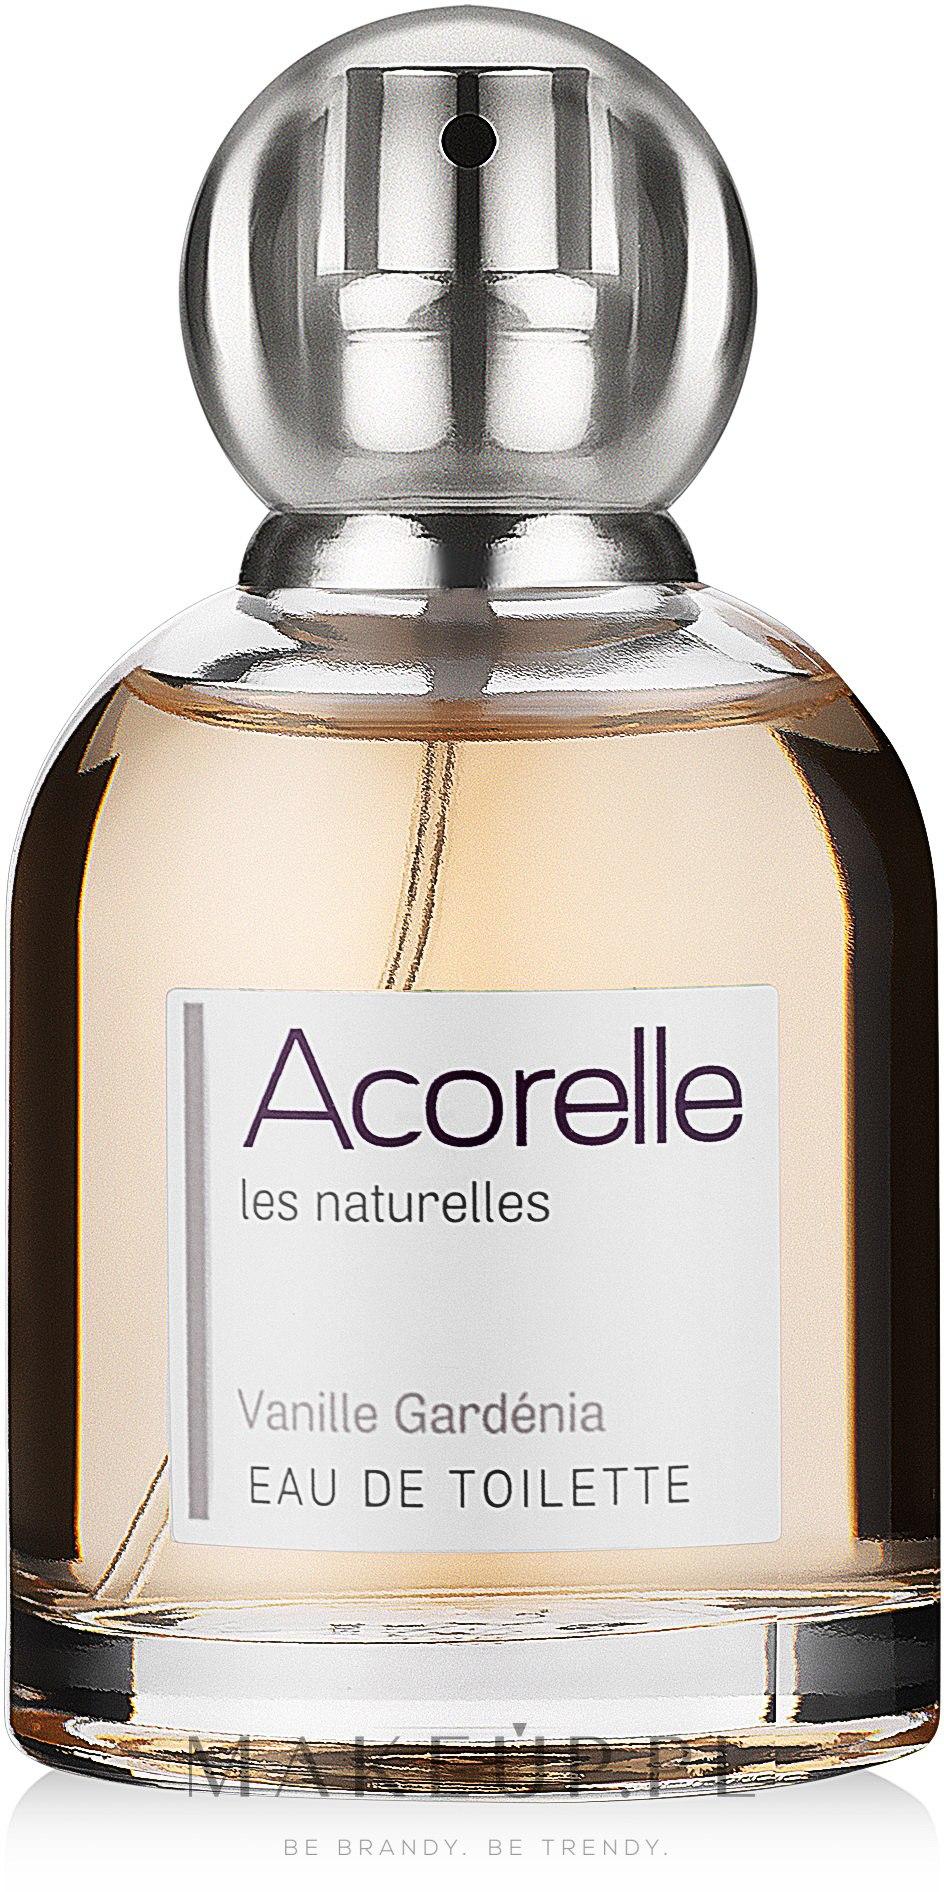 acorelle vanille gardenia